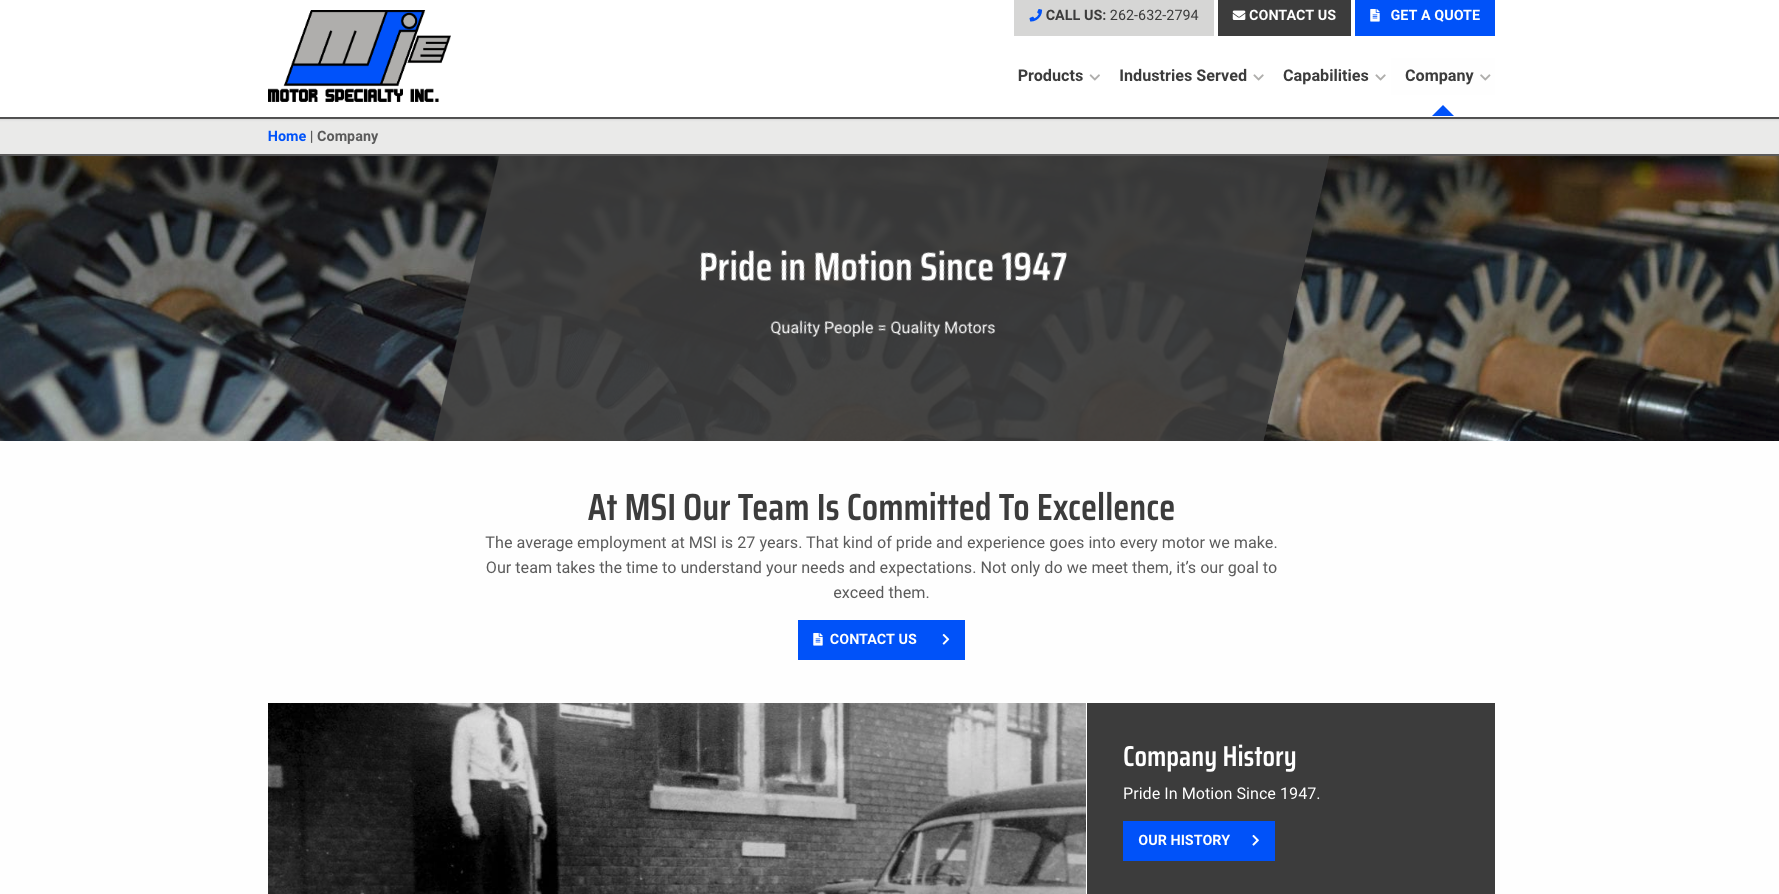 Motor Specialty Company Page